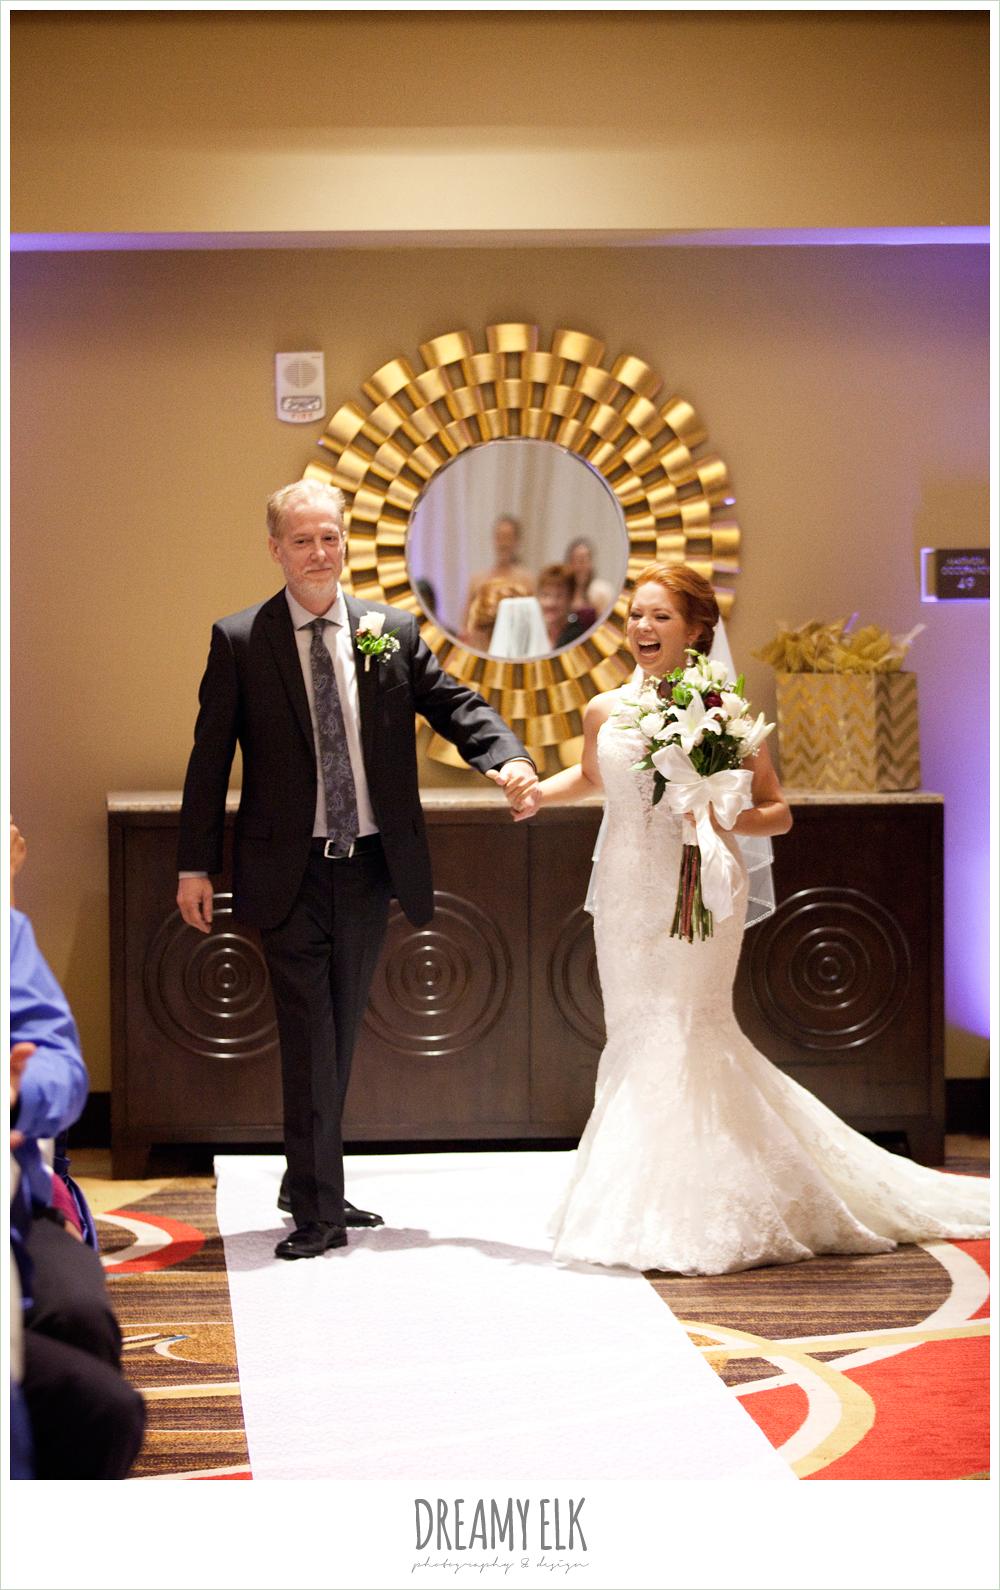 hilton hotel ballroom, university of houston, bride walking down the aisle, wedding ceremony, dreamy elk photography and design